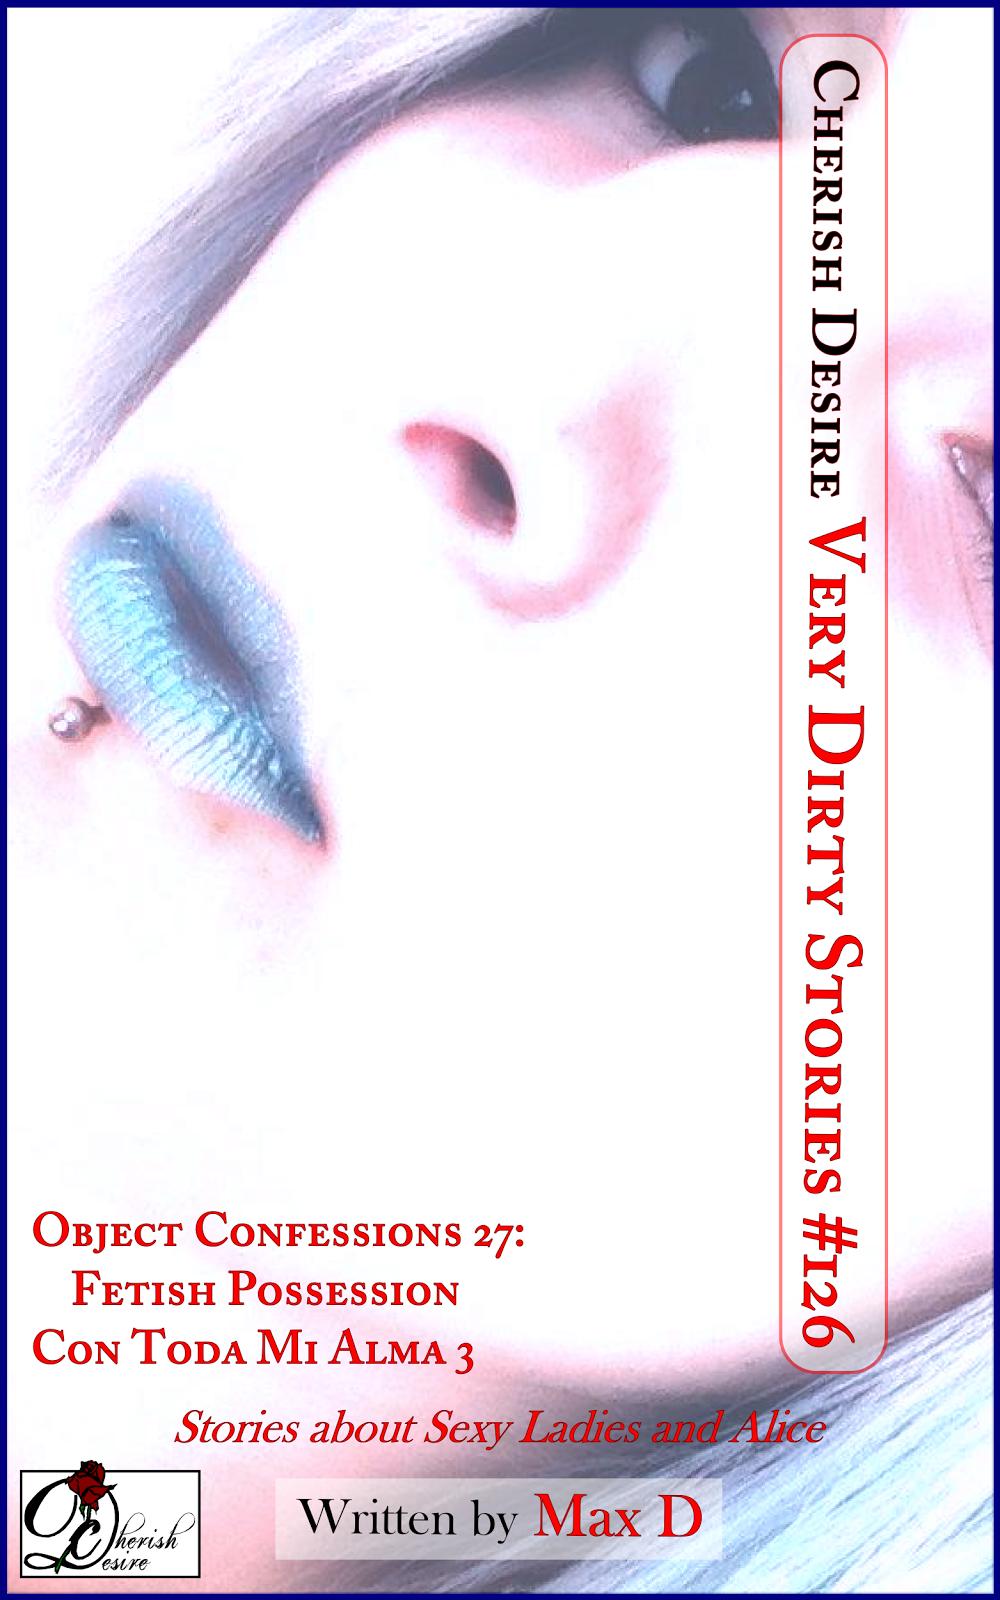 Cherish Desire: Very Dirty Stories #126, Max D, erotica